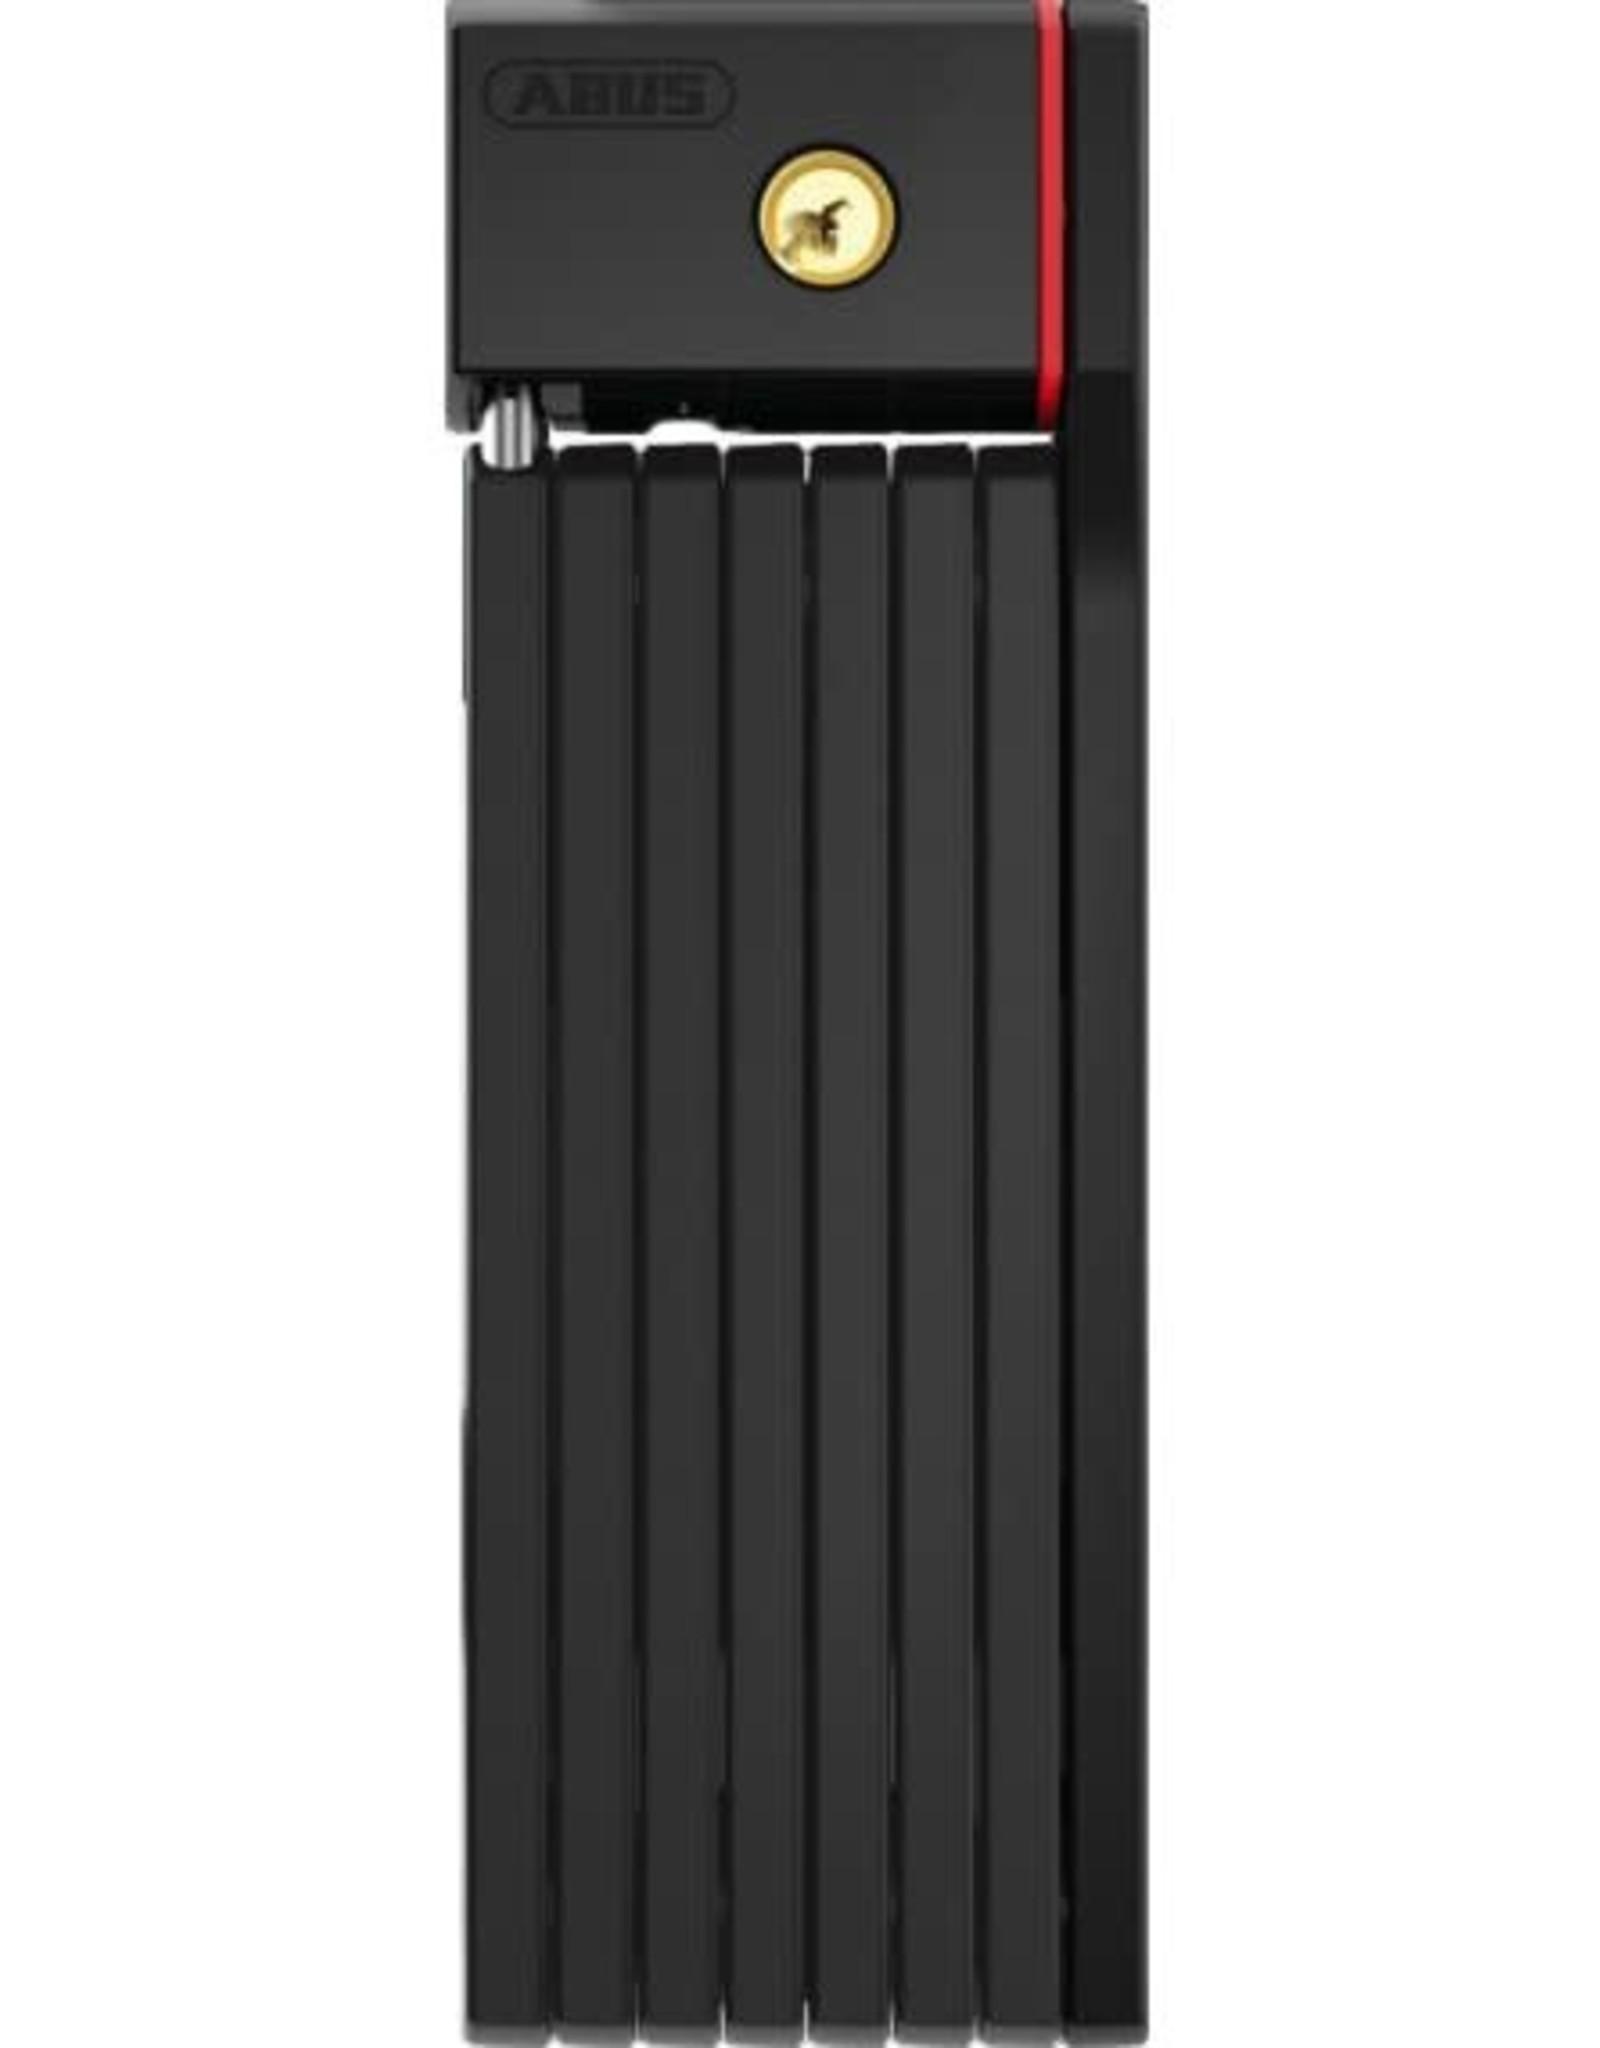 ABUS ABUS Folding Lock - uGrip BORDO 5700 BIG  KEYED w/ Bracket - 3.2 Feet - Black